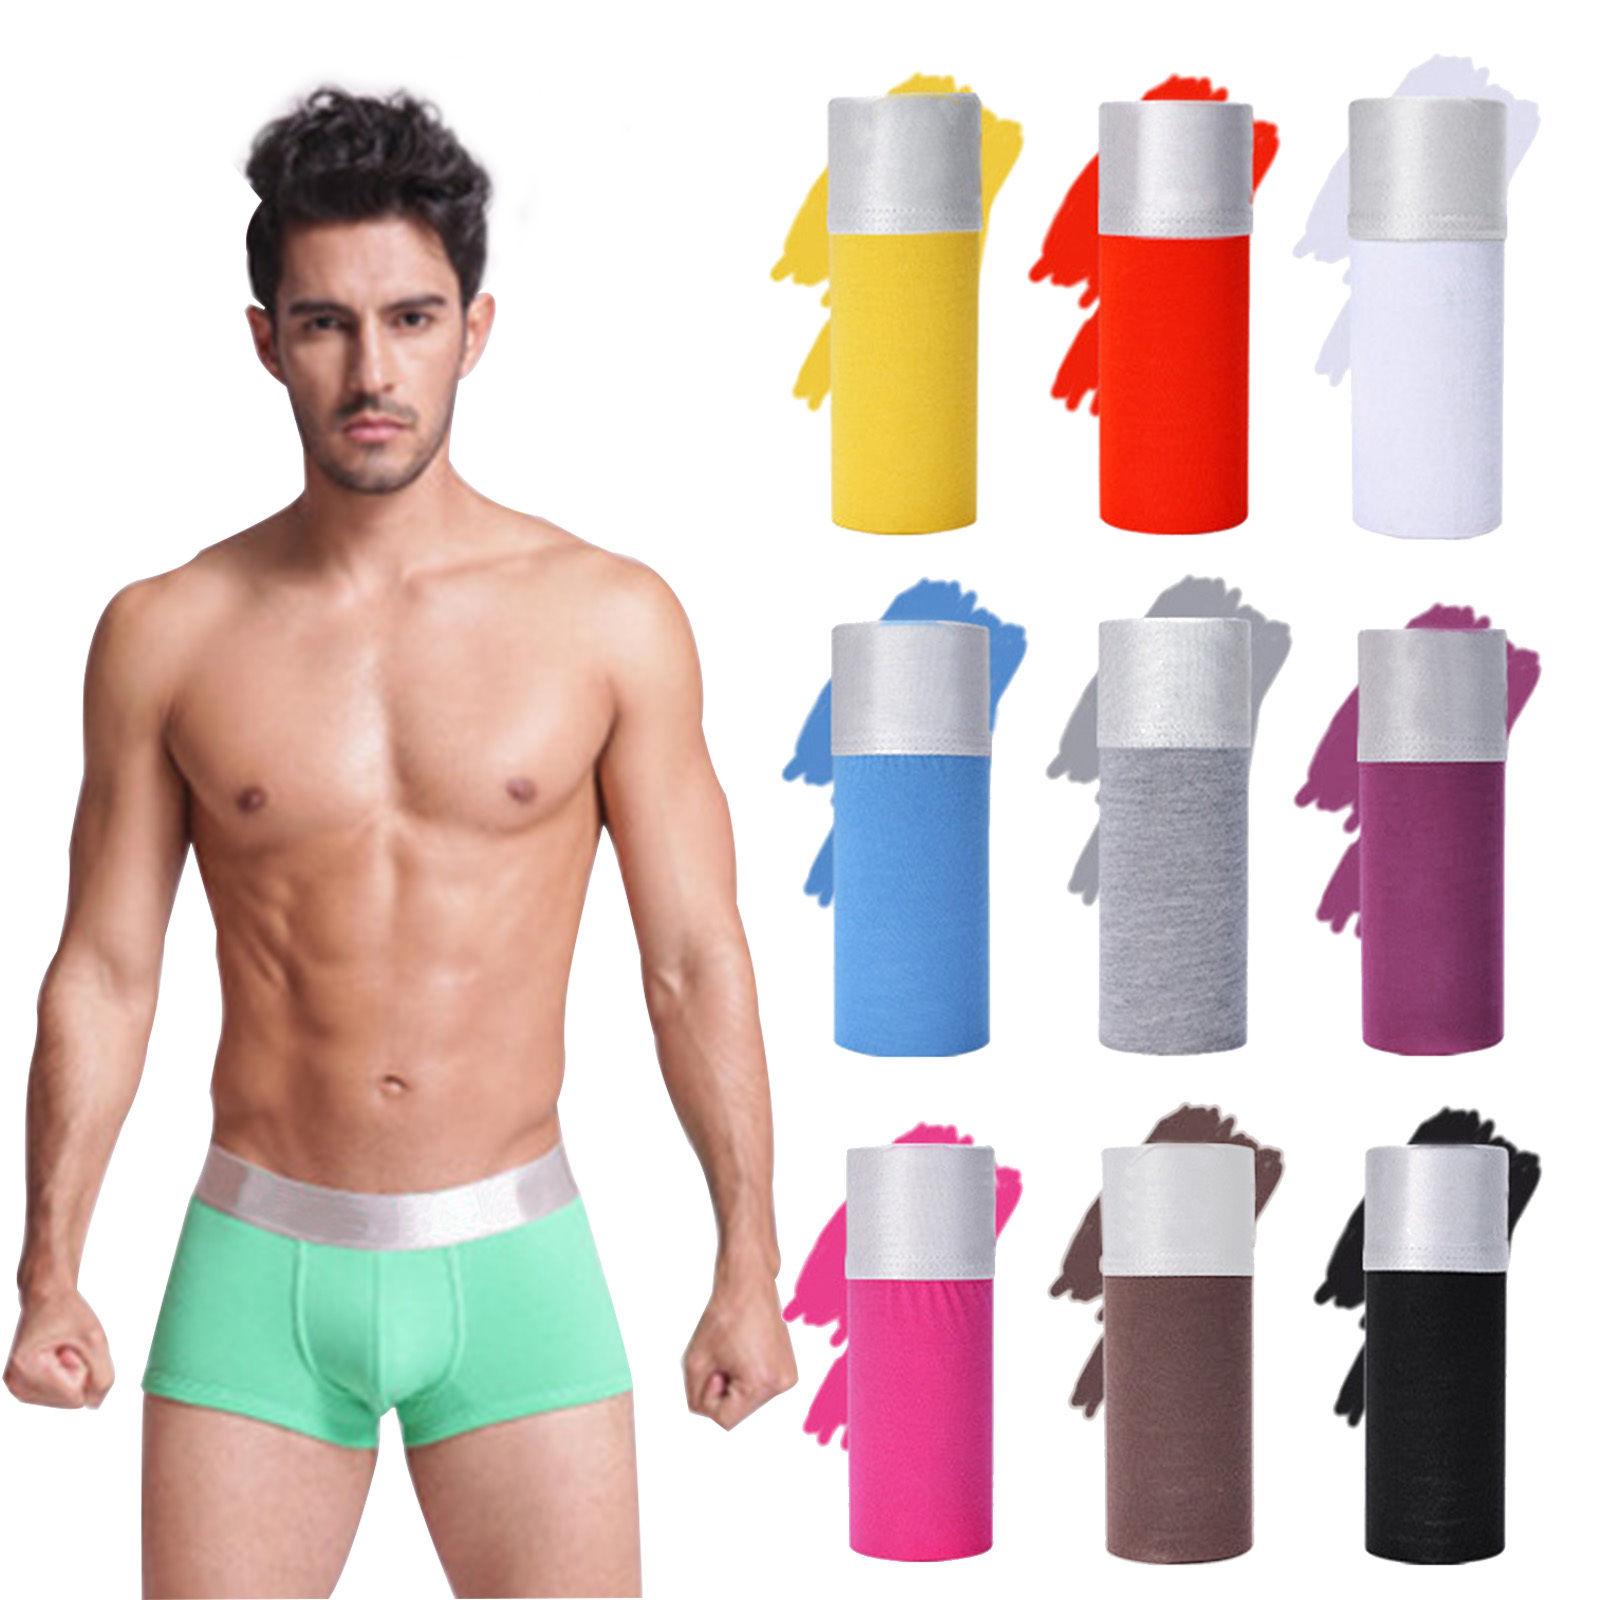 New Men Modal Trunks Briefs Boxers Short Underpants Underwear